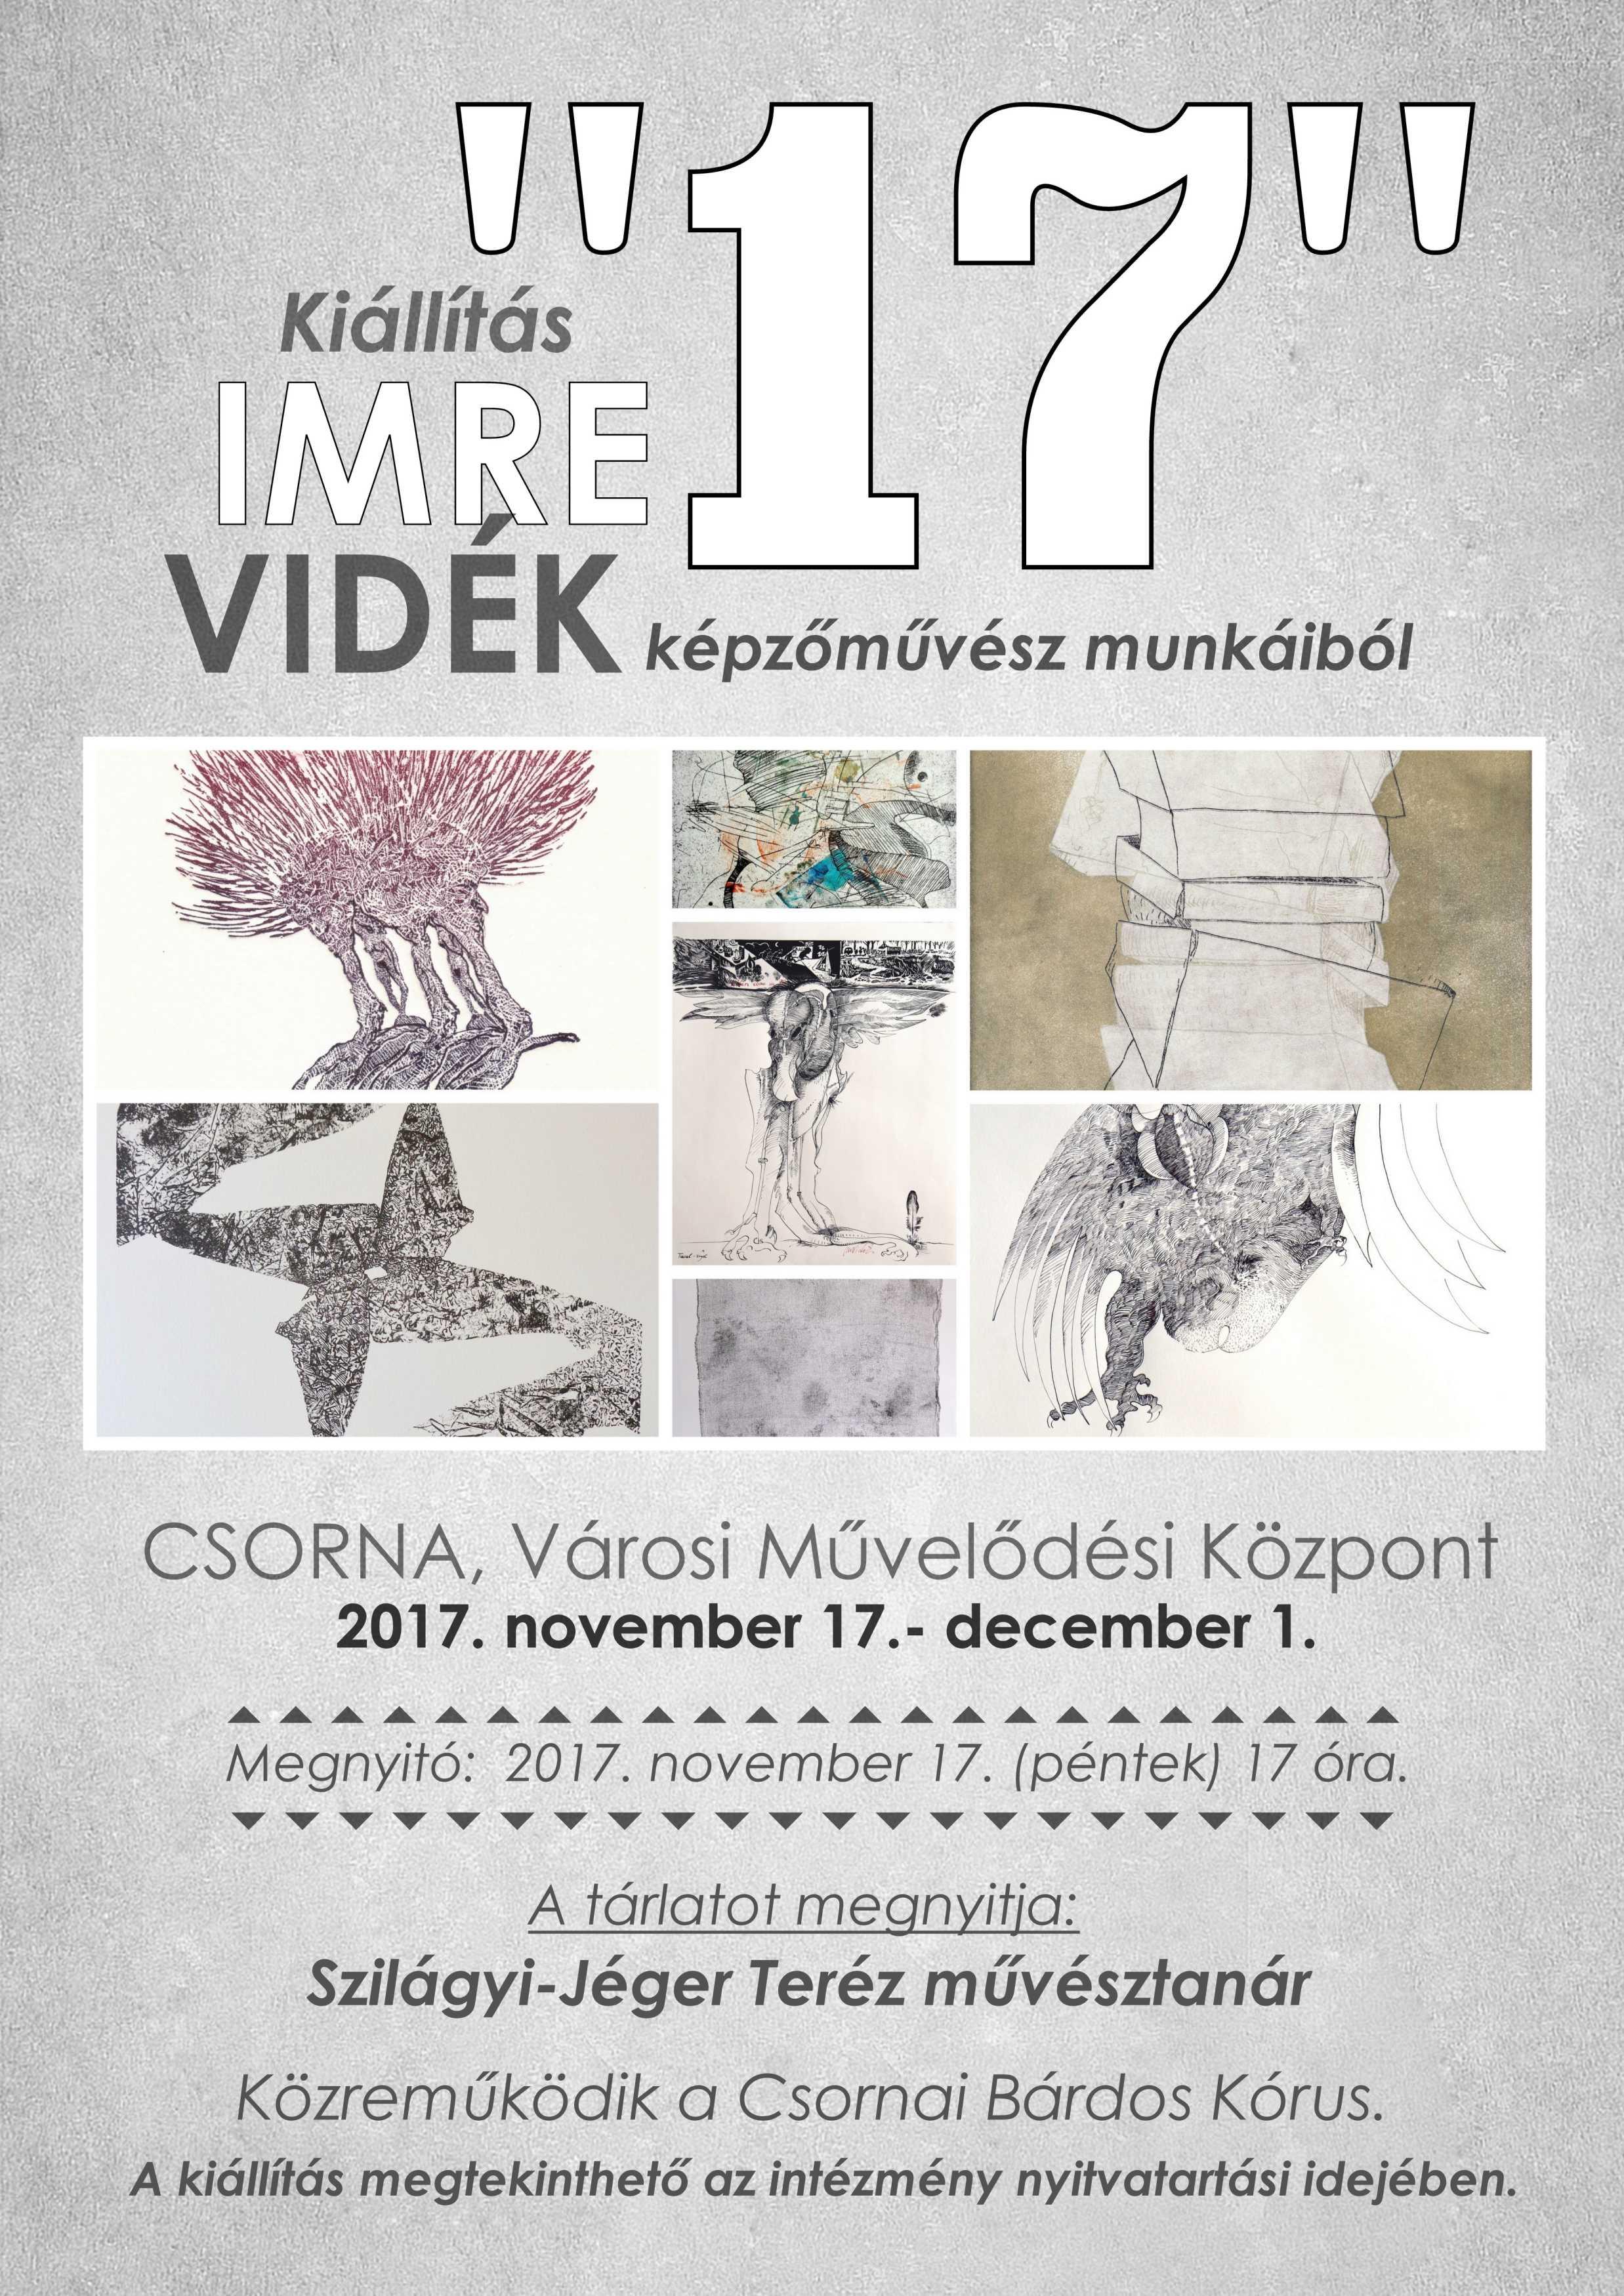 imre_videk_kiall_csorna_plakat